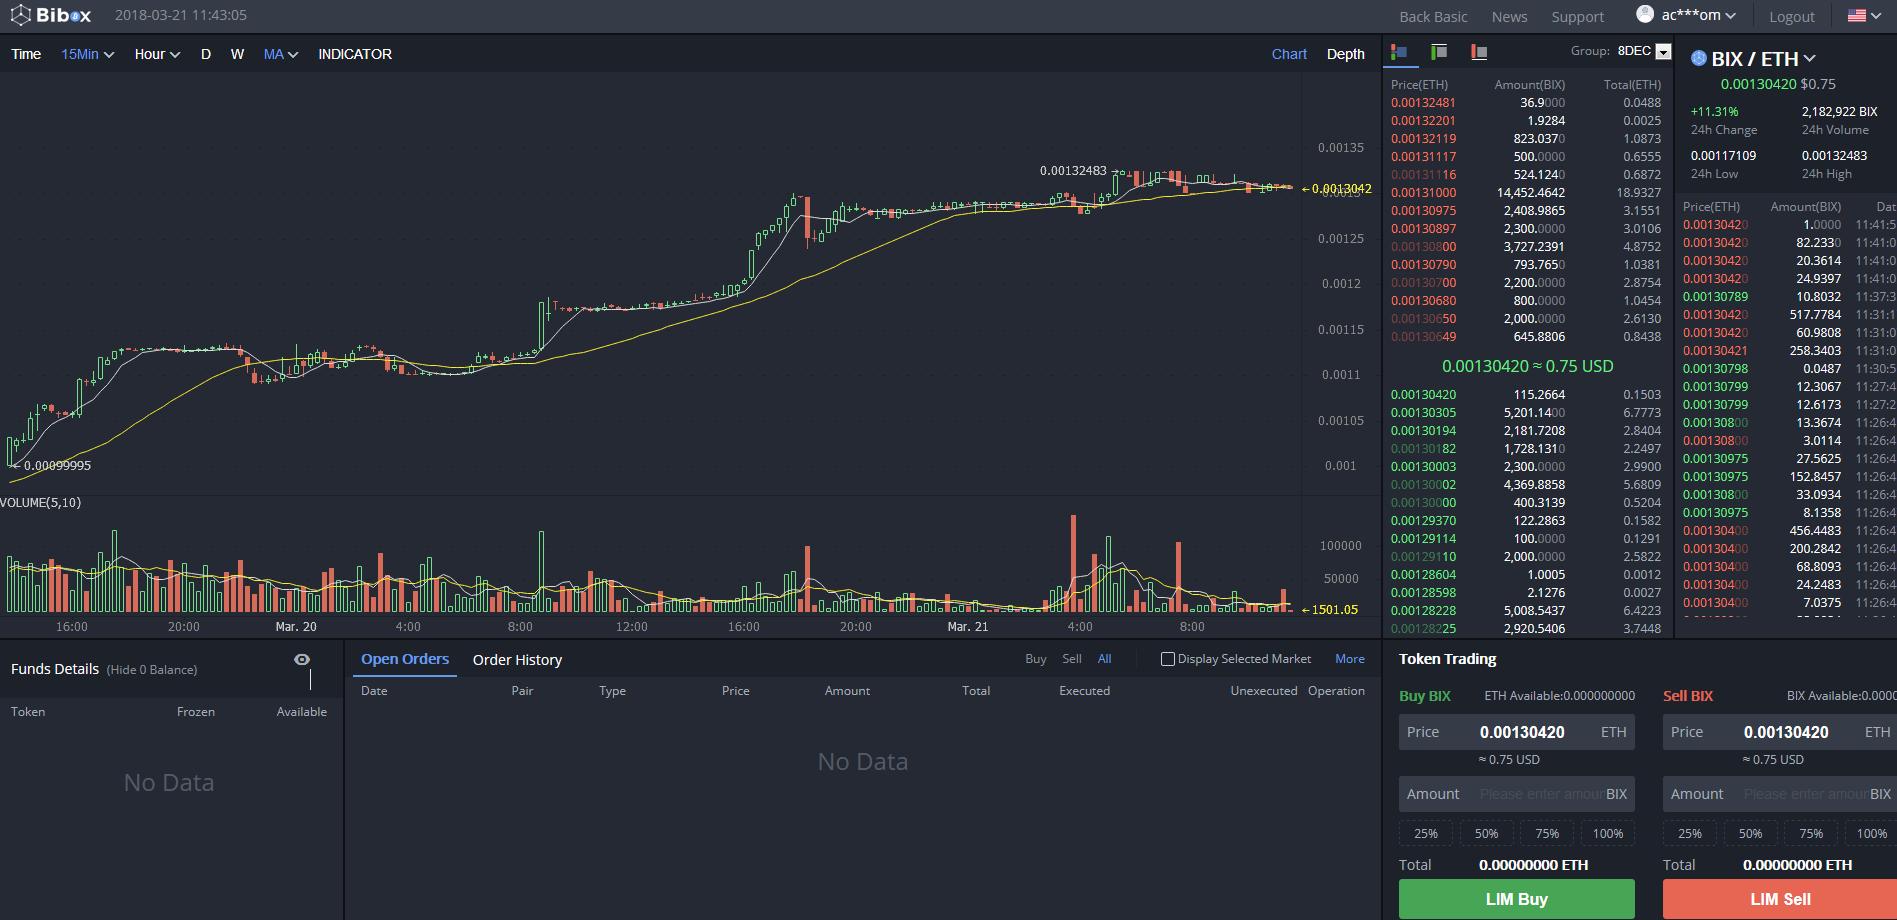 Bibox Trading View